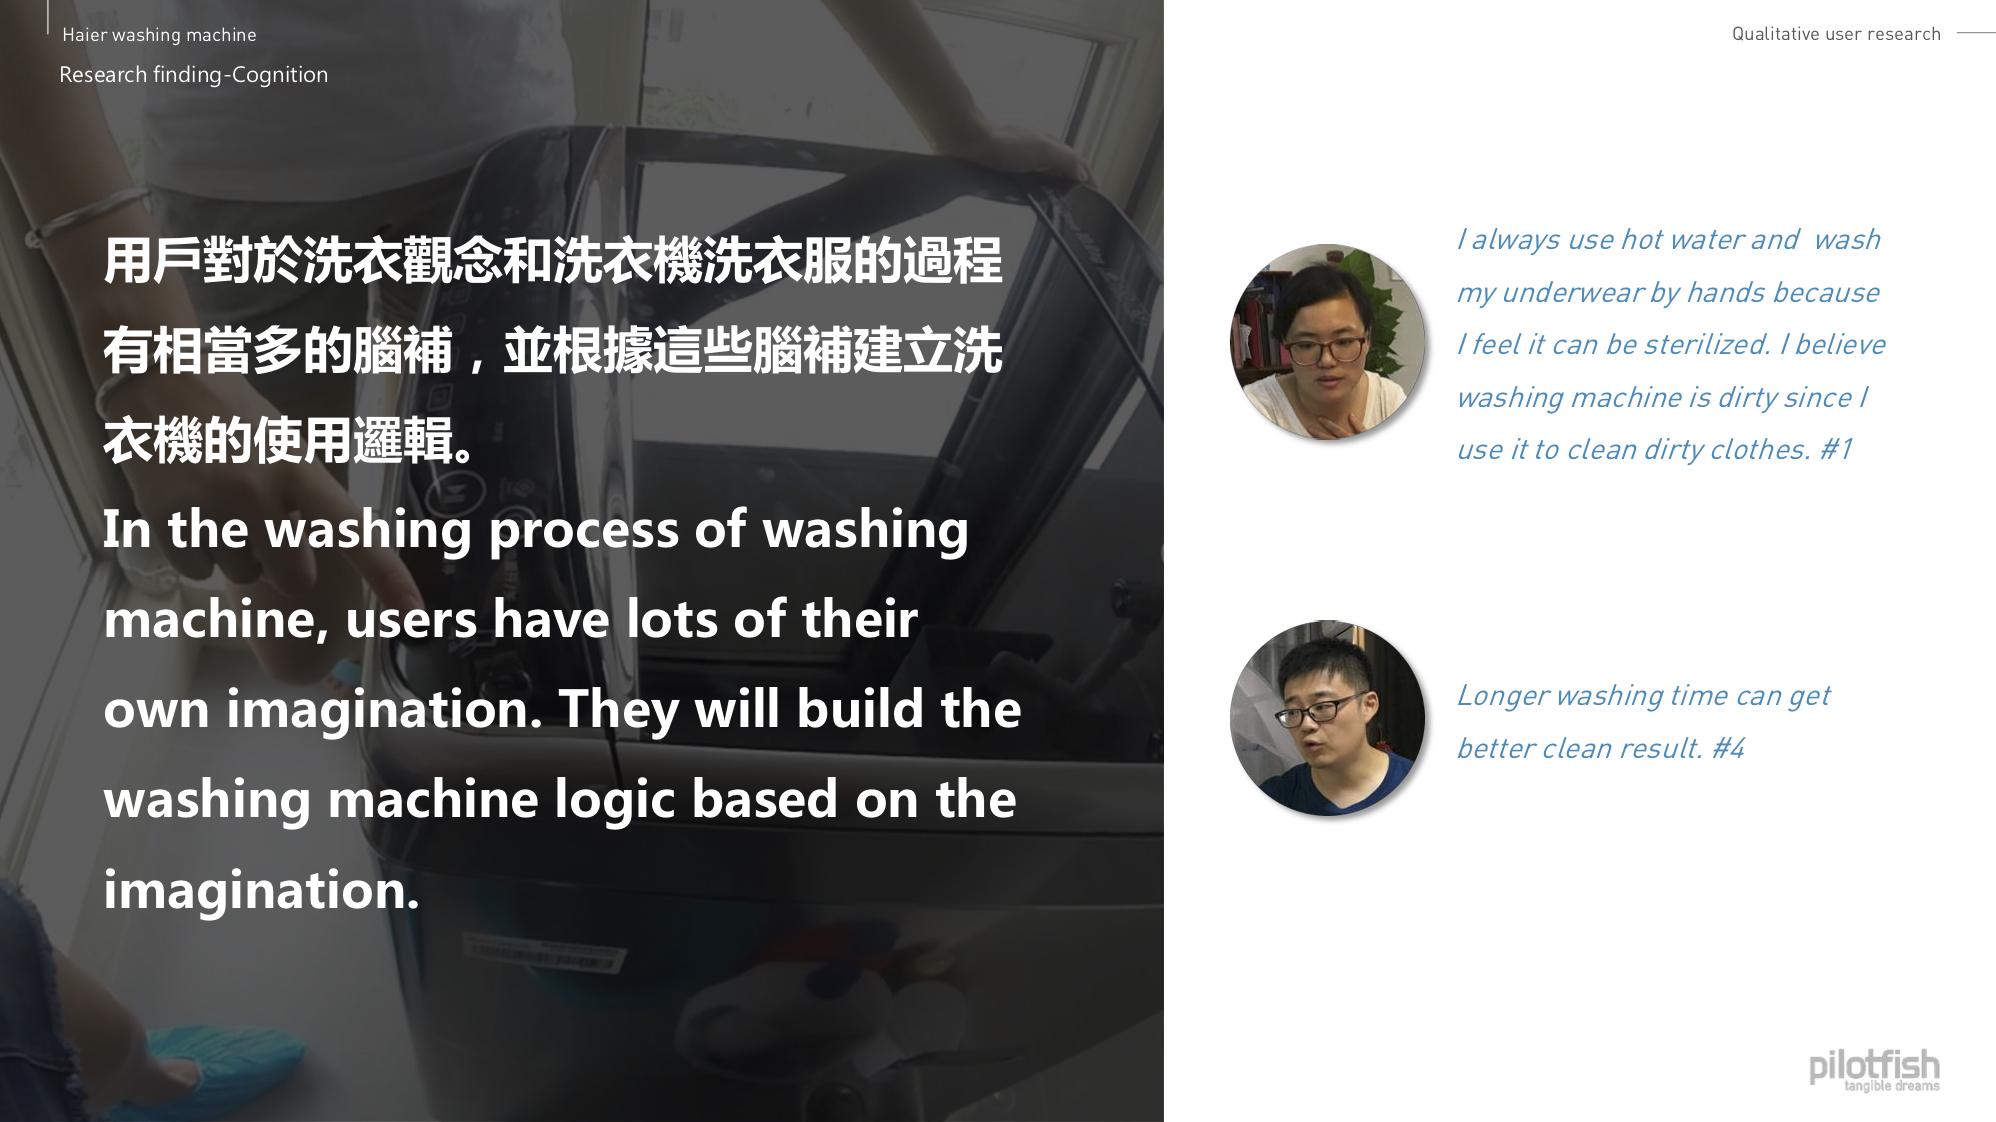 20170727_Haier_washing machine innovative UI_P0 presentation_V4_Eng_31.jpg